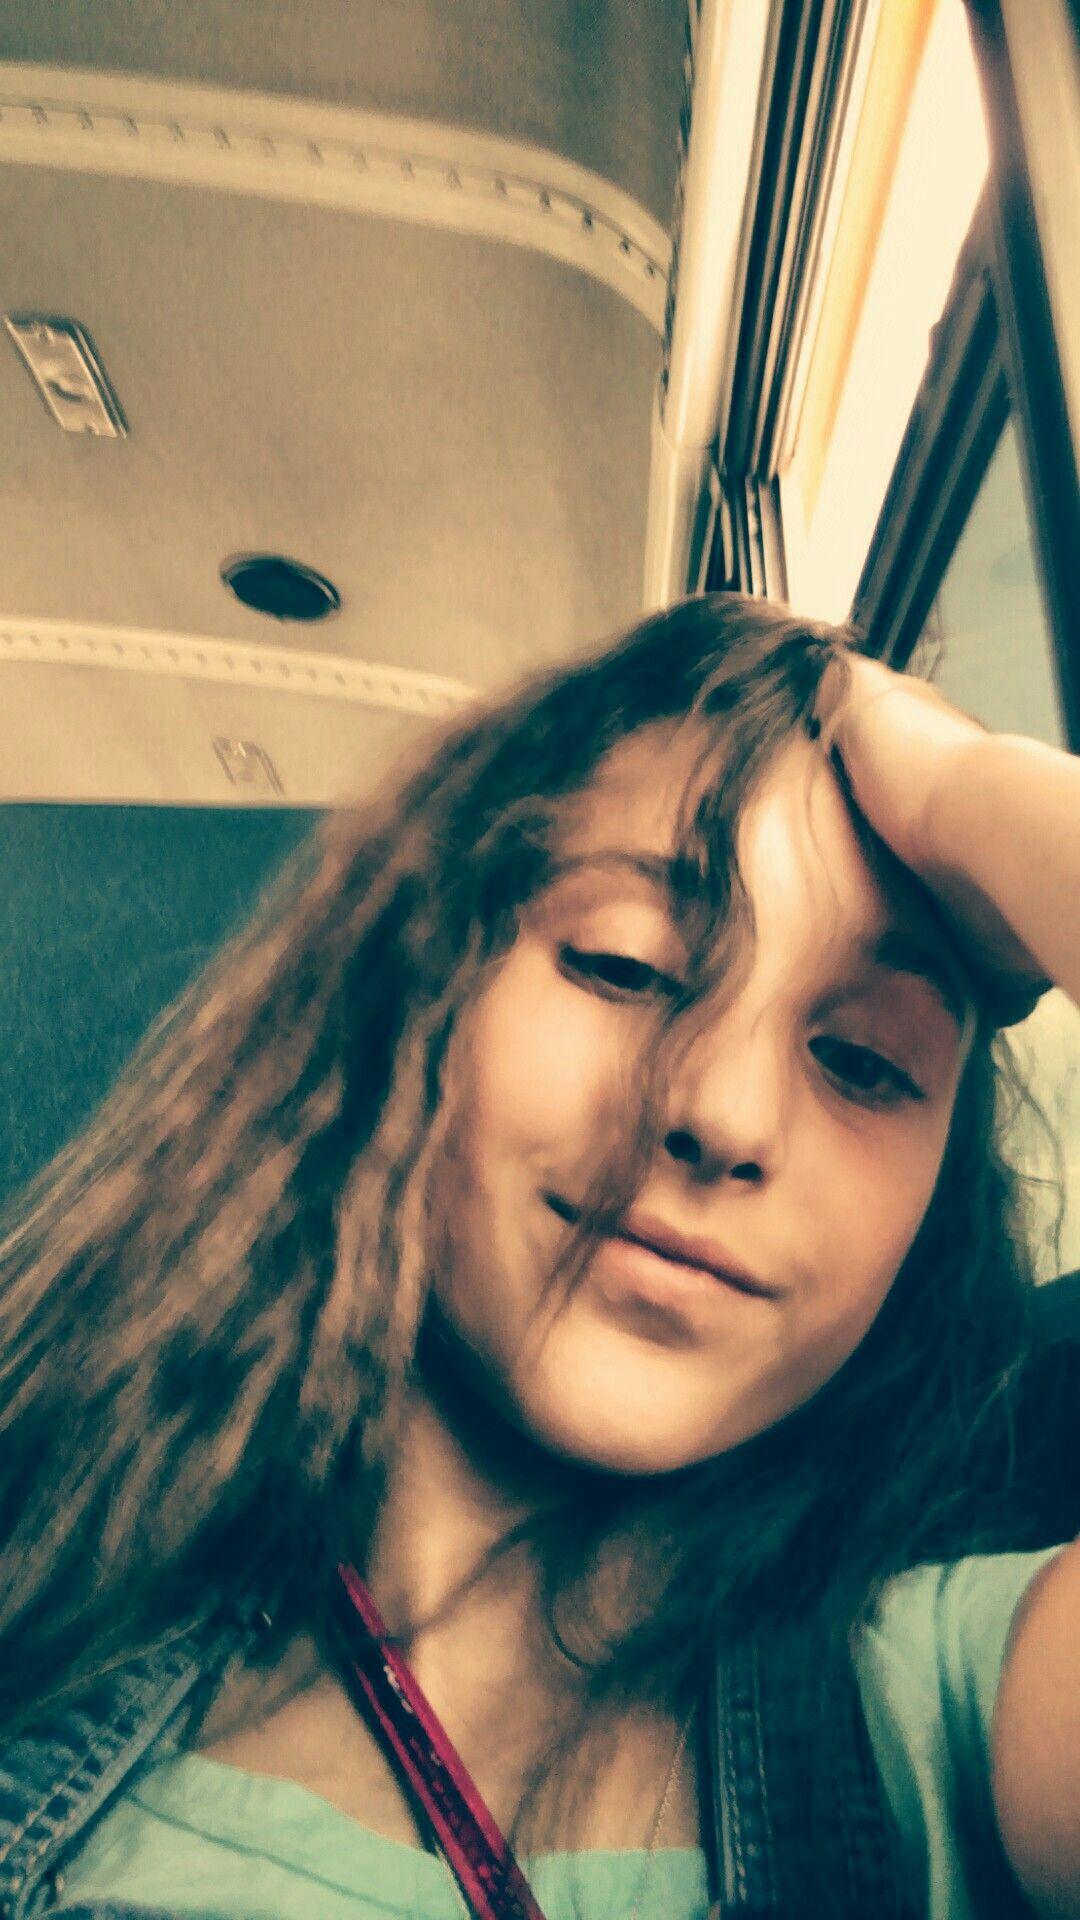 Selfie Maurie Smith nude photos 2019